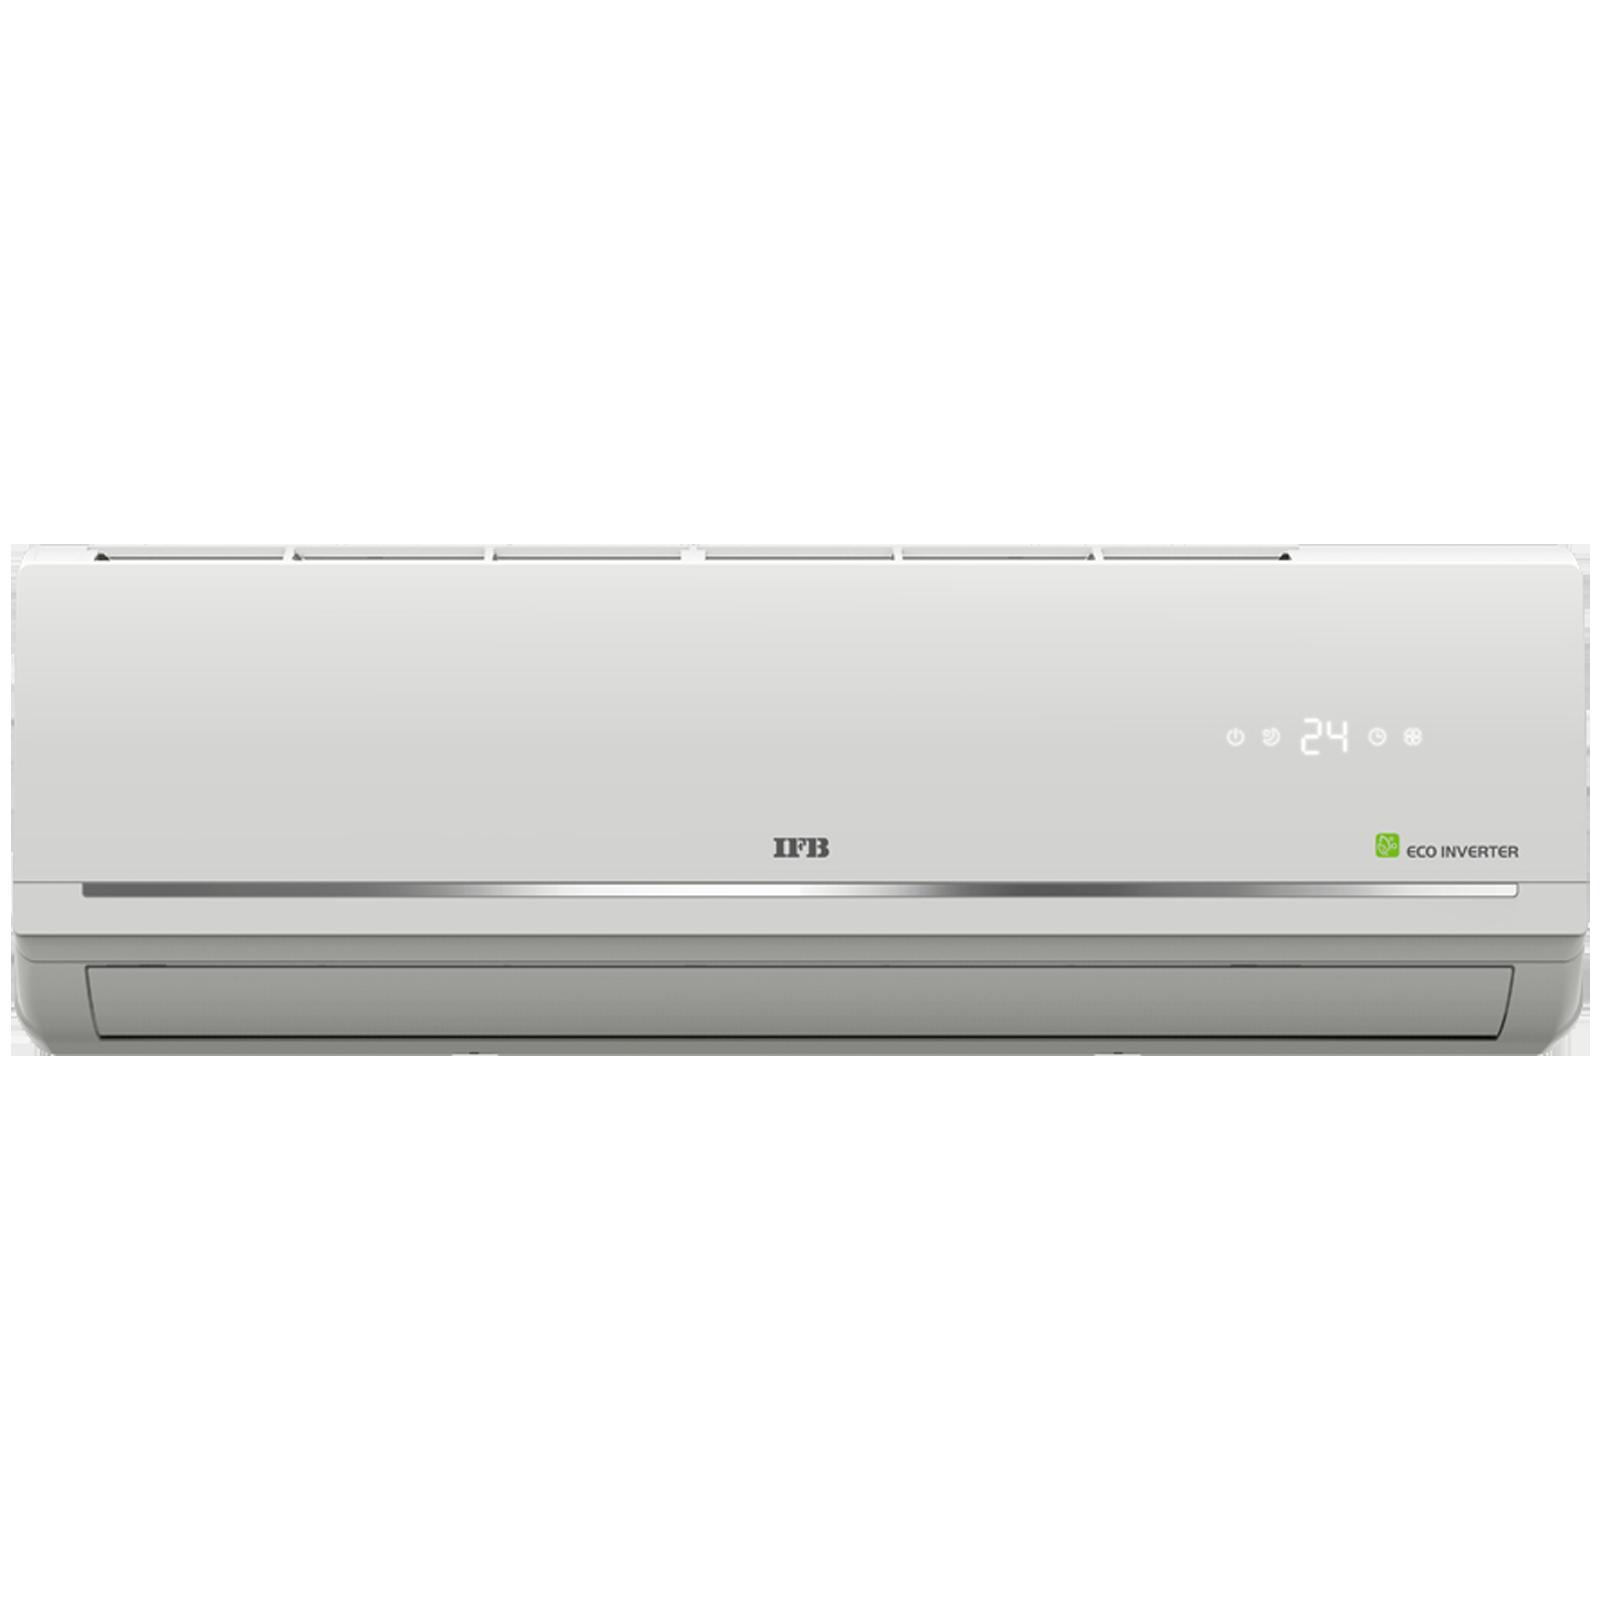 IFB Key Accounts 1.5 Ton 5 Star Inverter Split AC (Copper Condenser, IACI18BD5G3C, White)_1